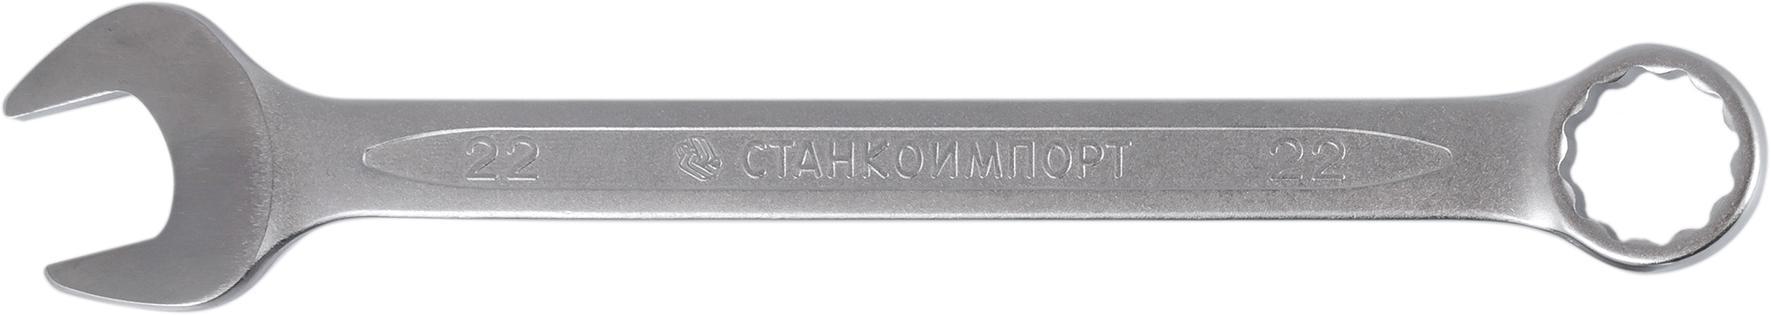 Ключ гаечный СТАНКОИМПОРТ КК.11.30.М12. набор инструмента станкоимпорт нг 1 12 42 8